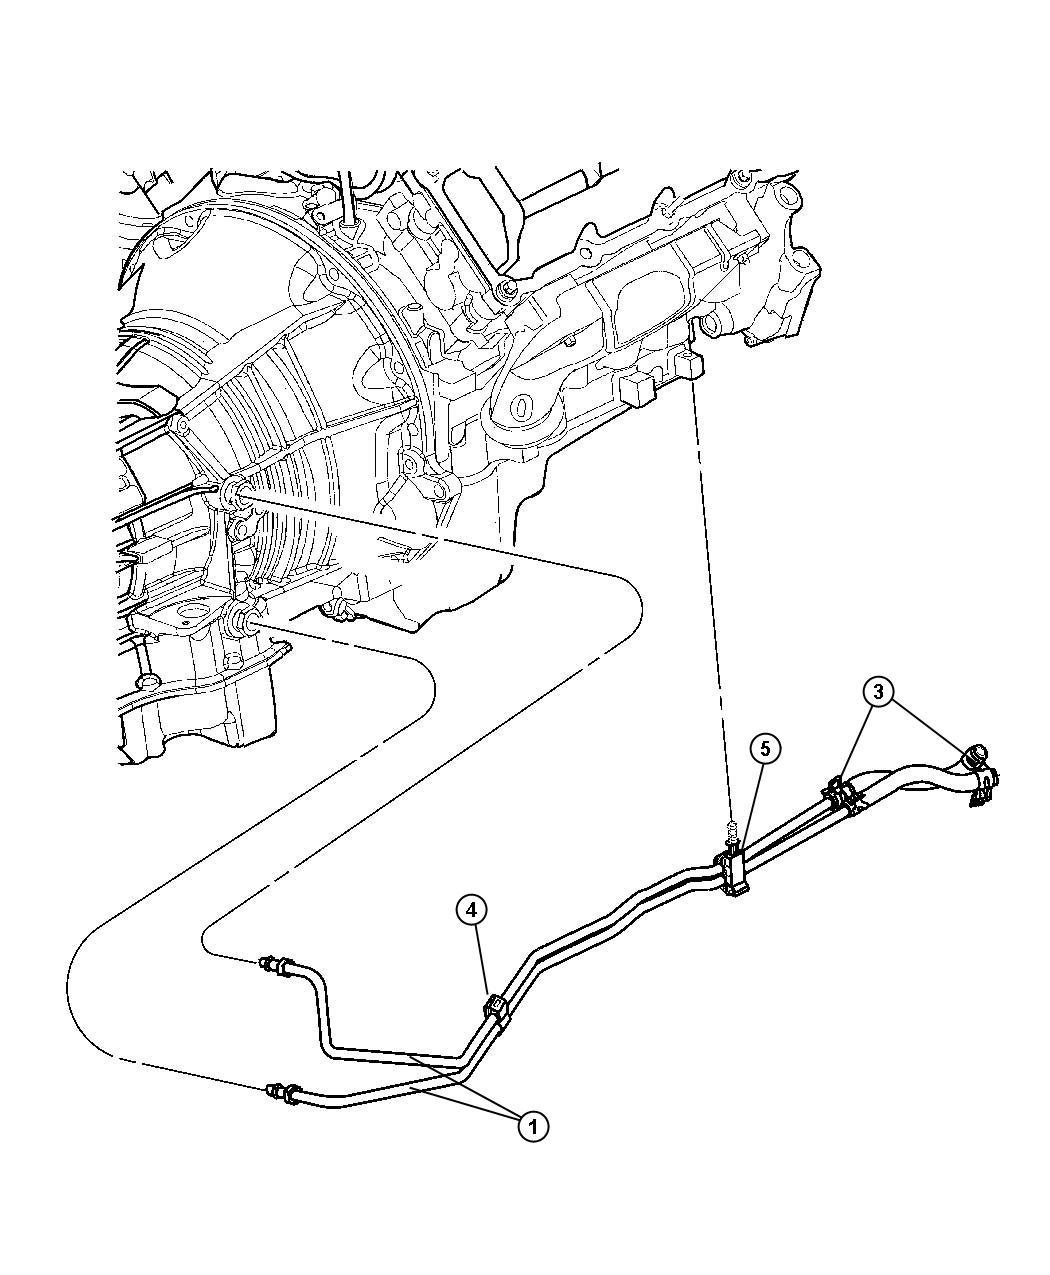 honda 300ex atv engine diagram